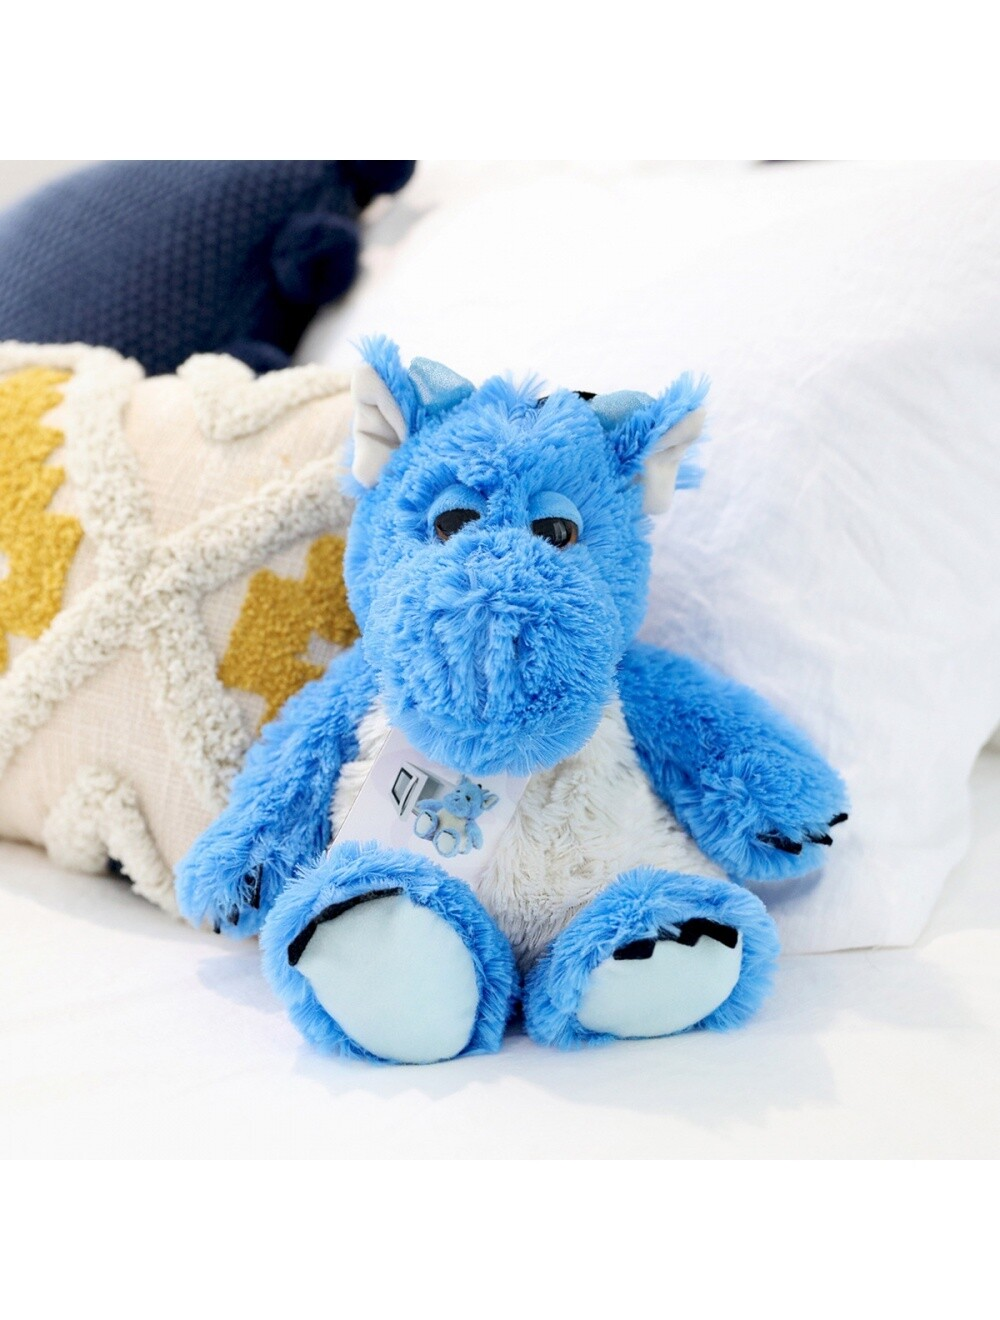 Warmies - Blue Dragon